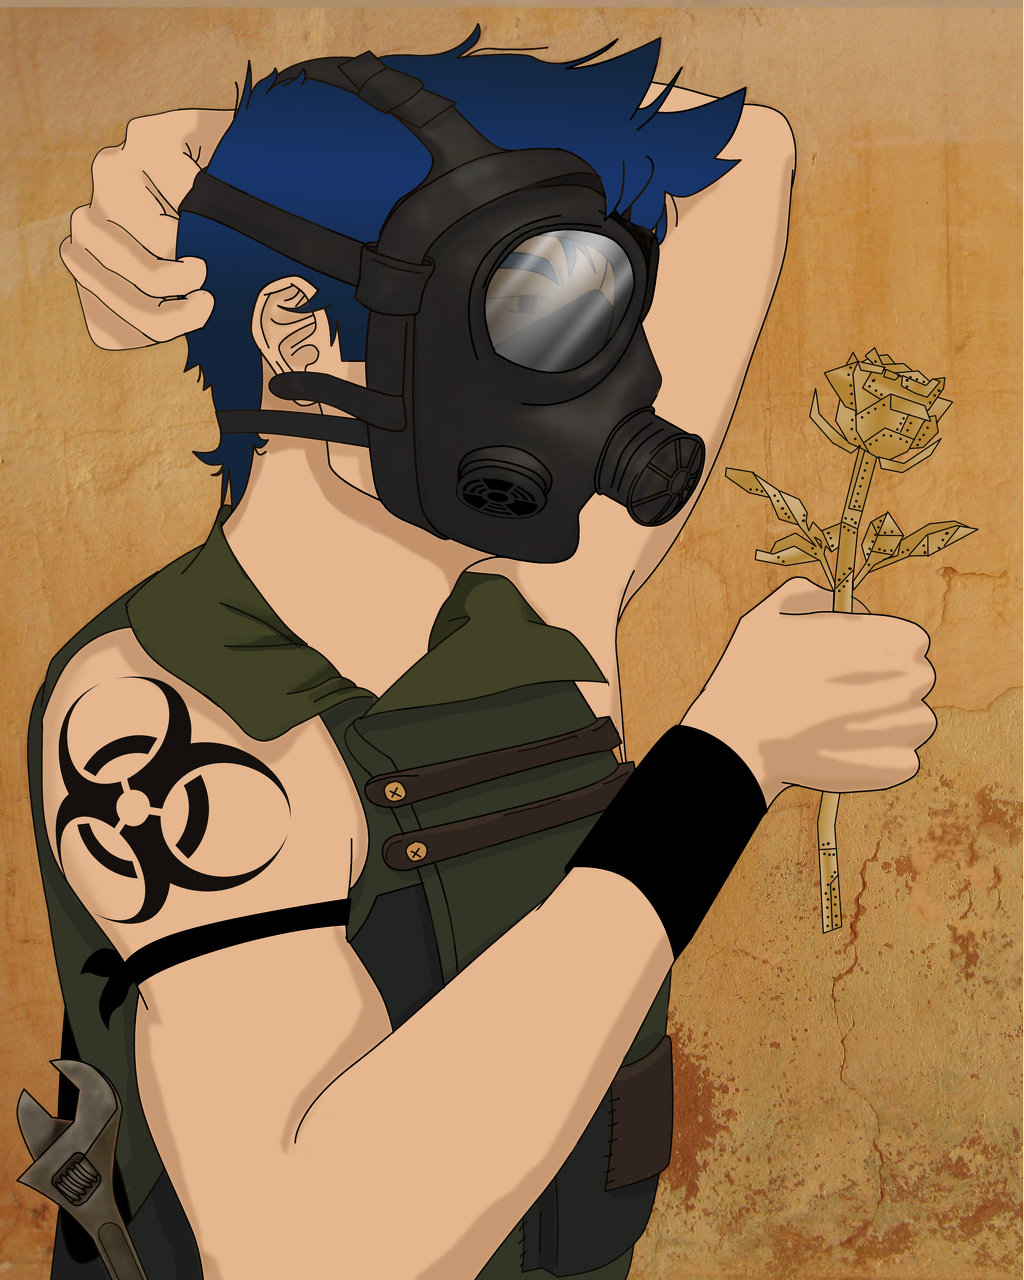 gas_mask_guy_2.jpg